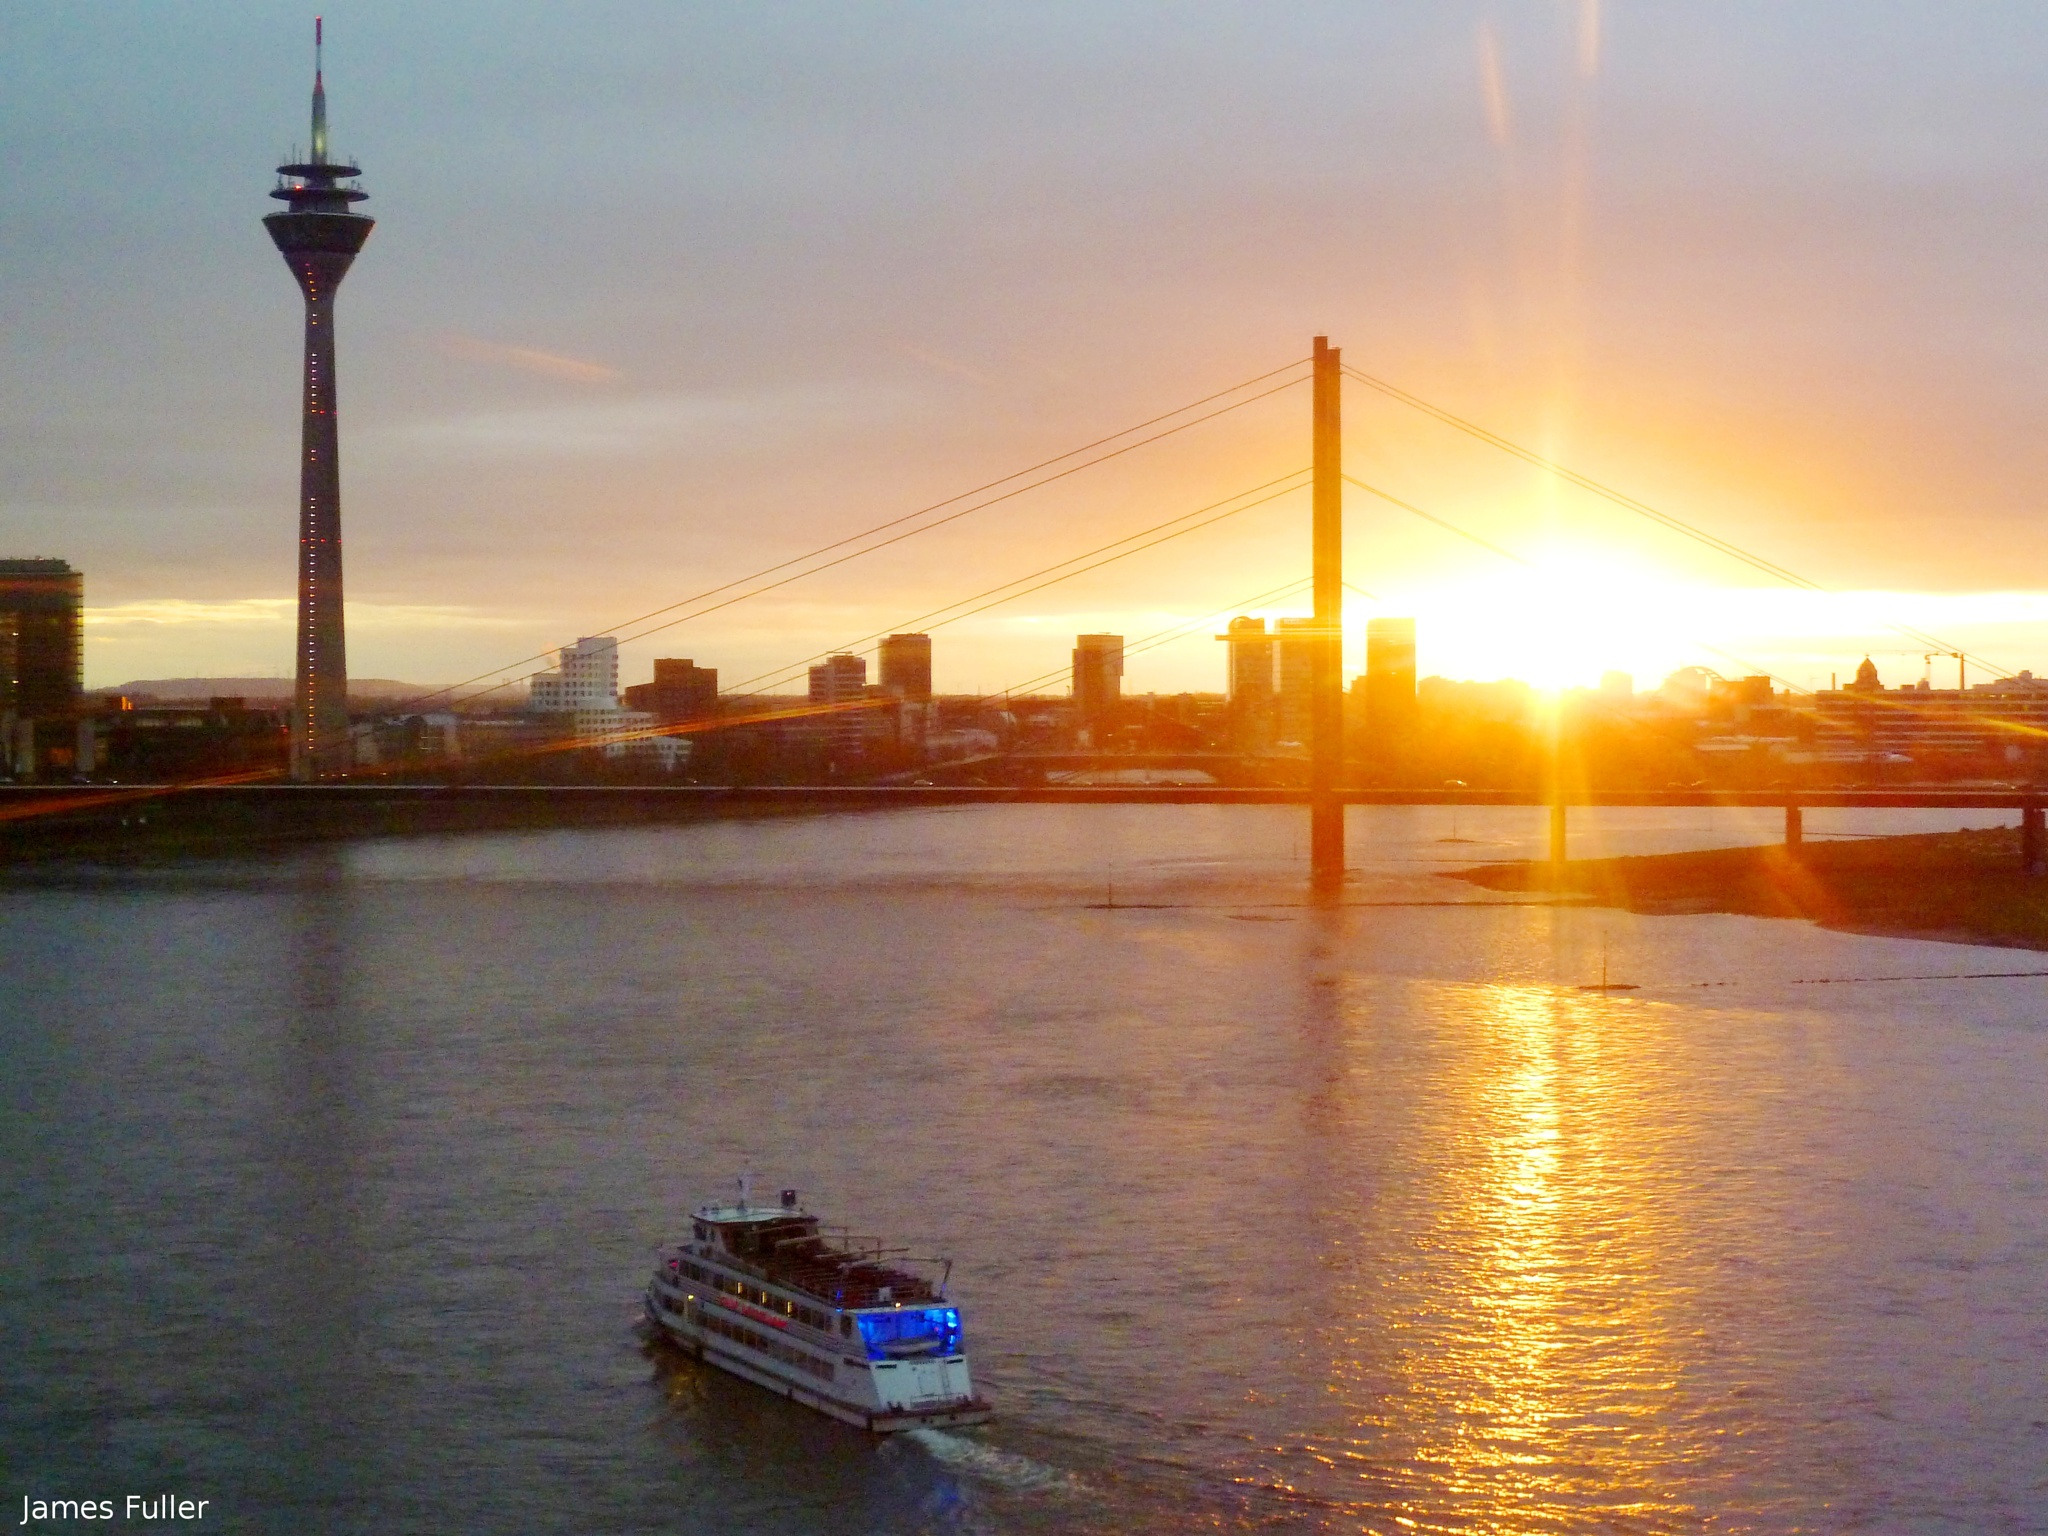 Dusseldorf Sunset by James Fuller